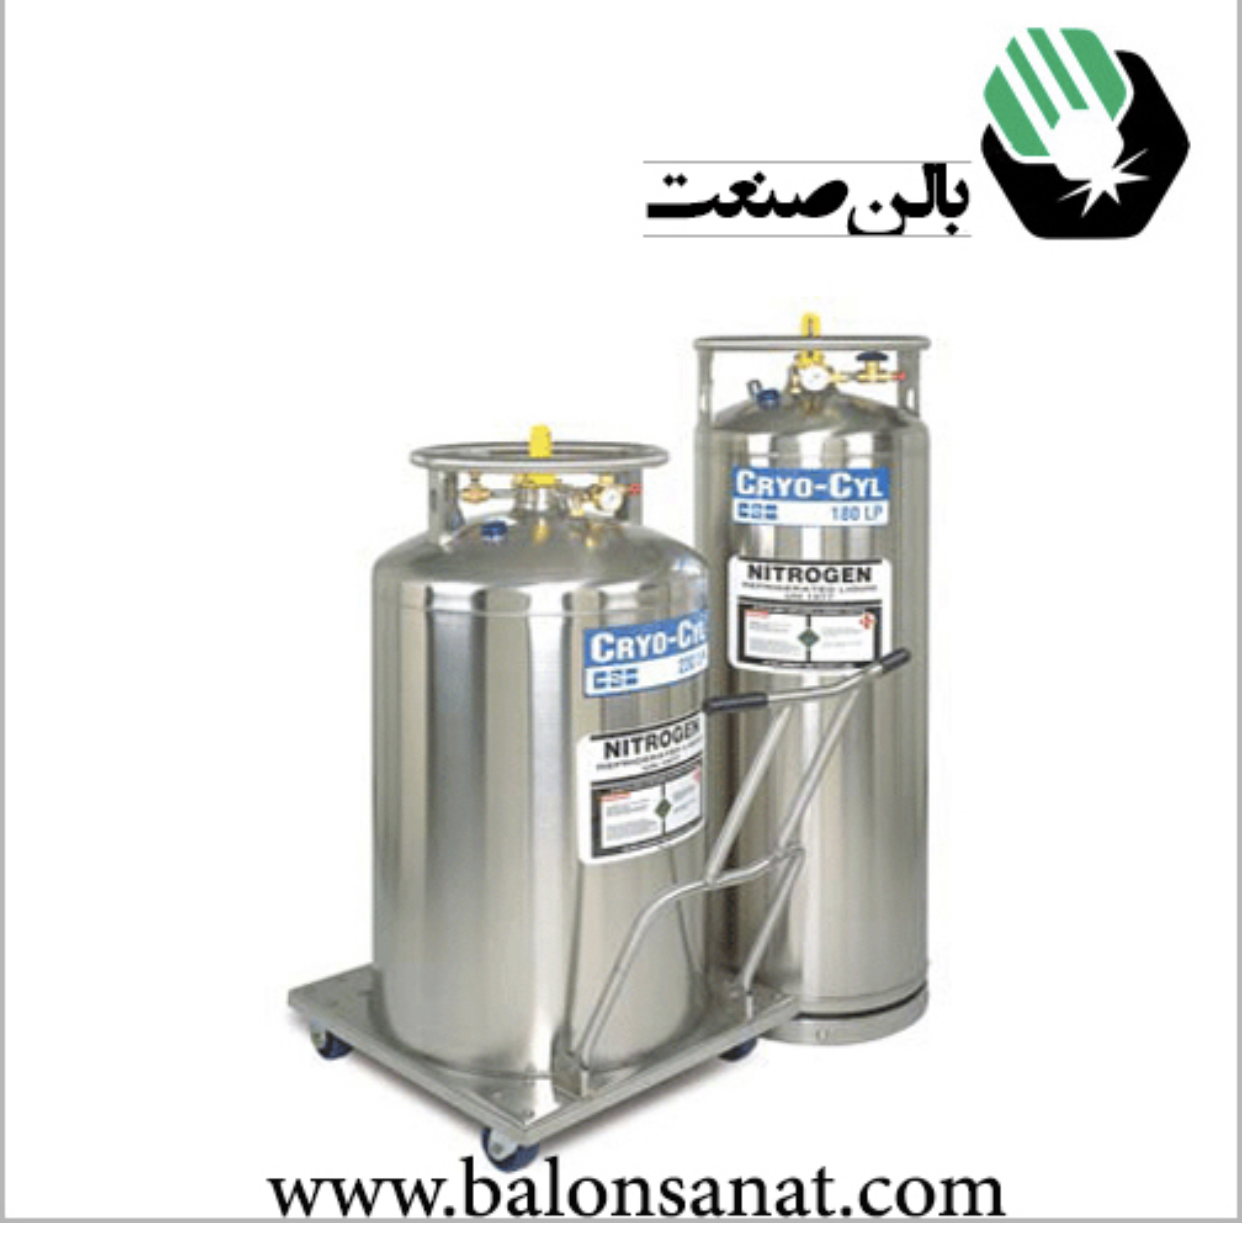 مخزن کرایوژنیک و مایعات کرایوژنیک